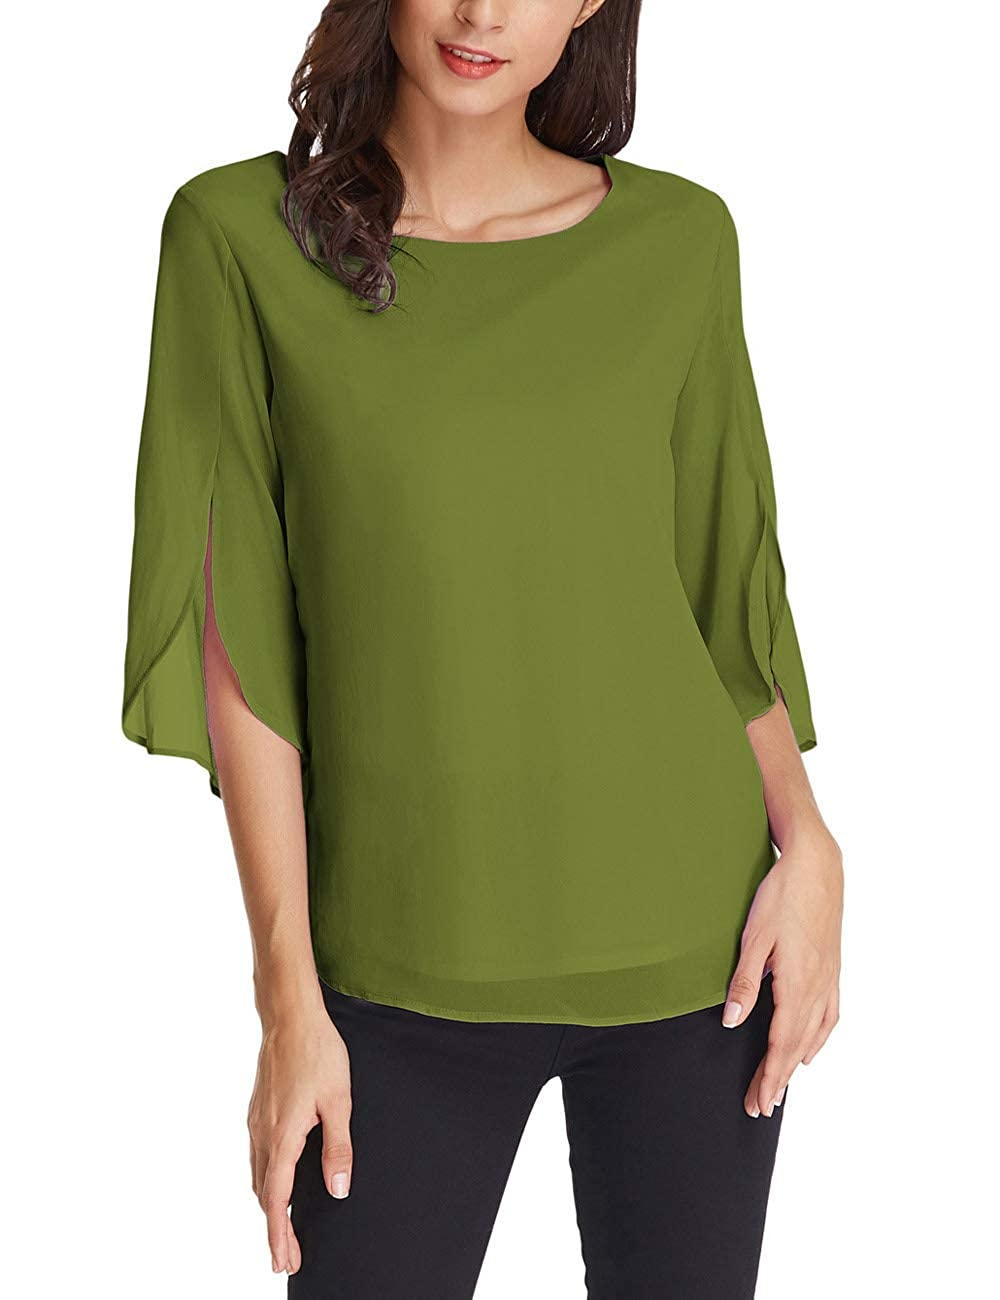 d8ab207a3 GRACE KARIN Women's Casual Chiffon Blouse Tops Half Ruffle Sleeve at Amazon  Women's Clothing store: